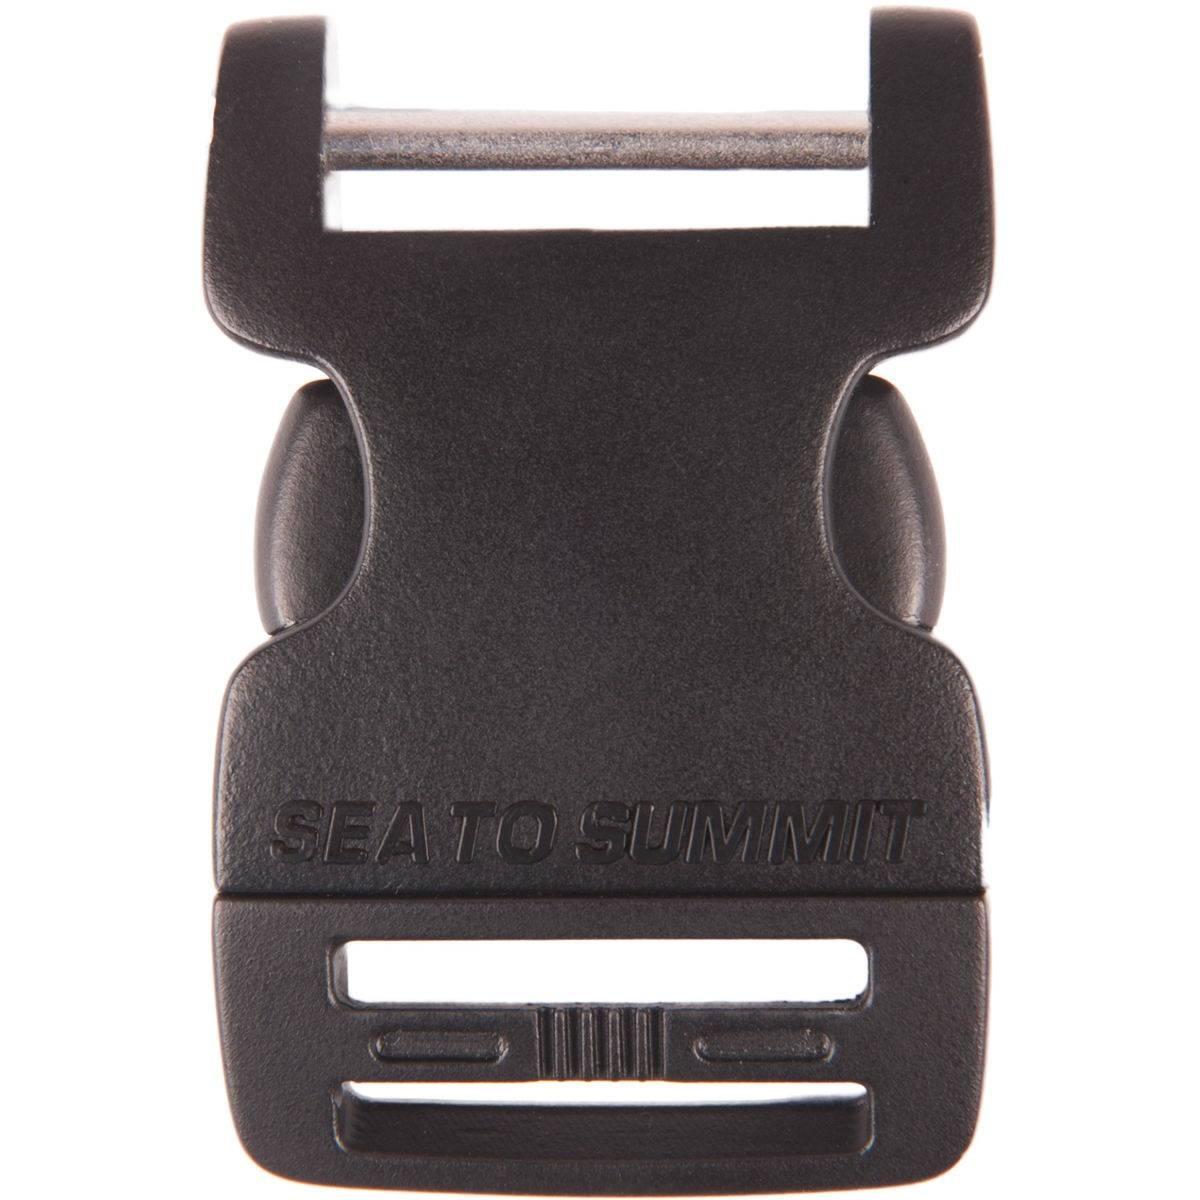 Sea to Summit Field Repair Buckle Side Release 1 Pin 25 mm - Gurtschnalle - Bild 2